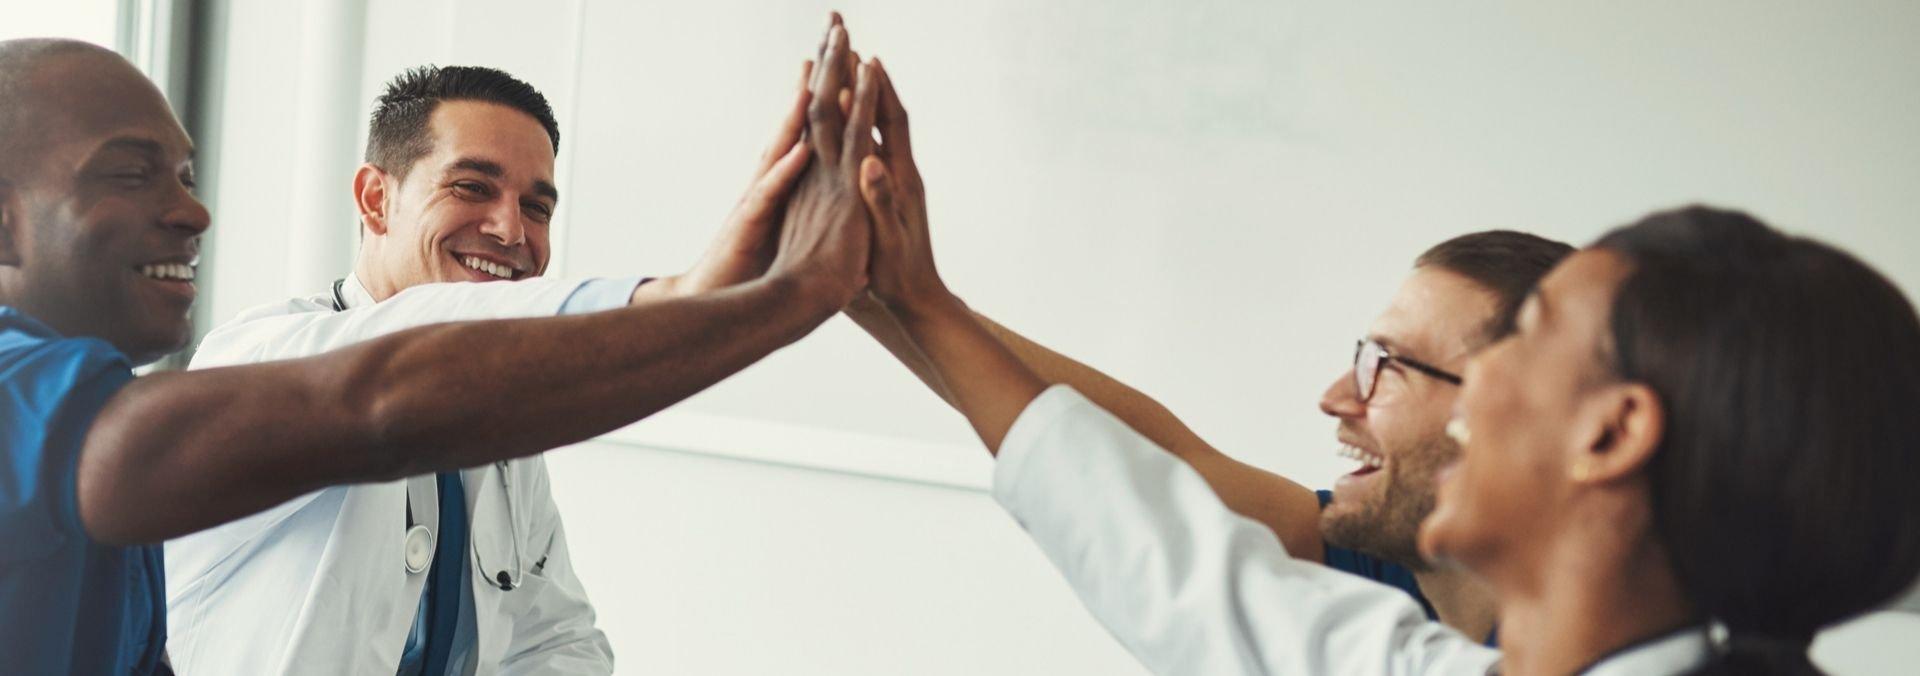 teamwork in healthcare office